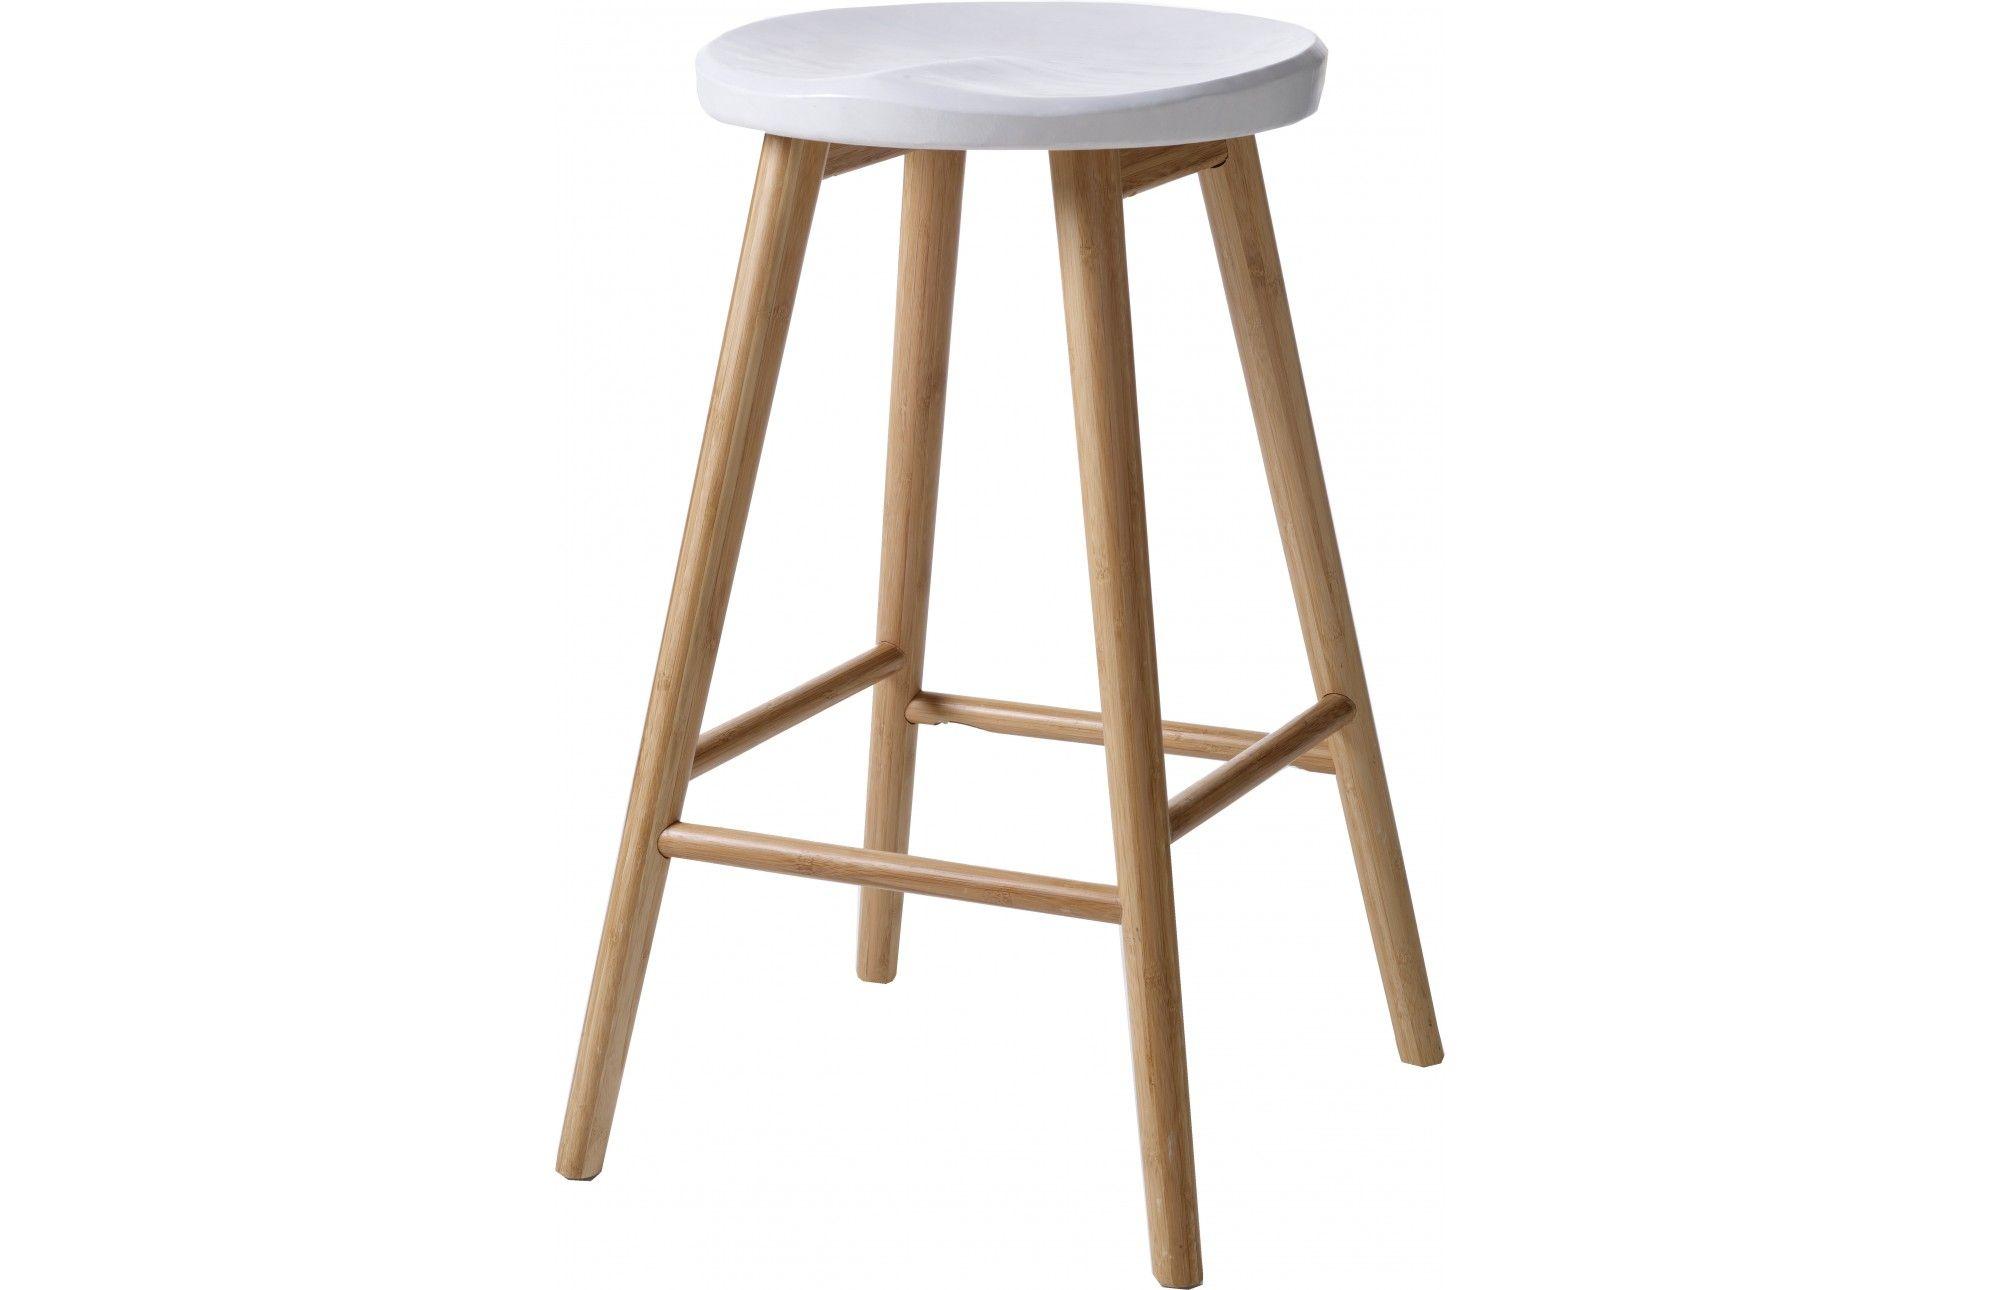 Kiki Designer White Bar Stool   Designer bar stools, Bar stool and ...